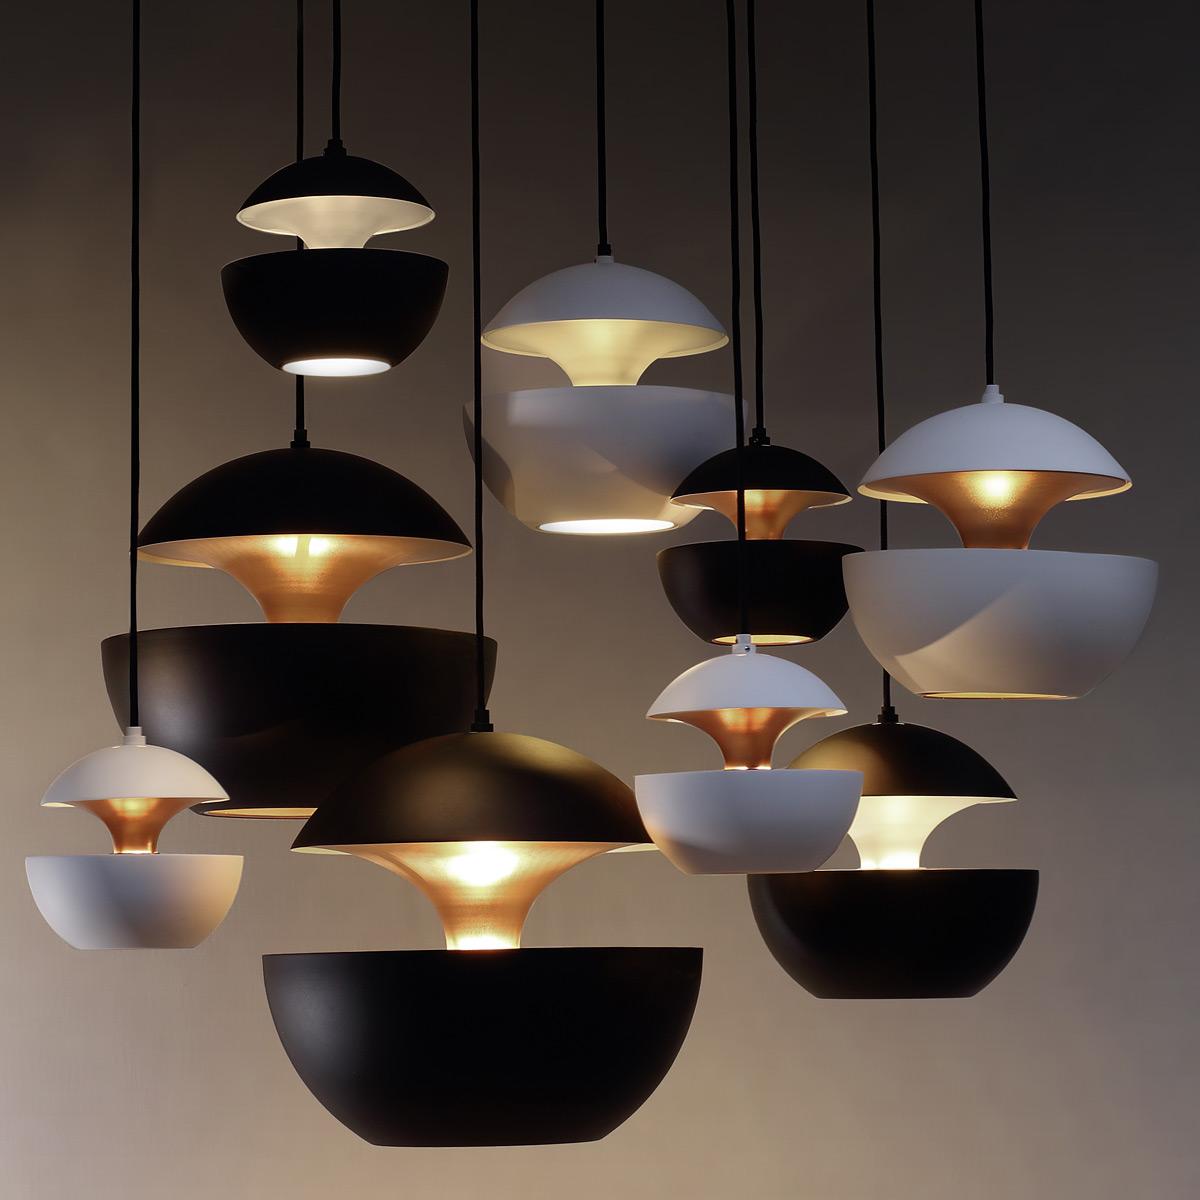 wei e kugel h ngeleuchten sixties design here comes the sun casa lumi. Black Bedroom Furniture Sets. Home Design Ideas